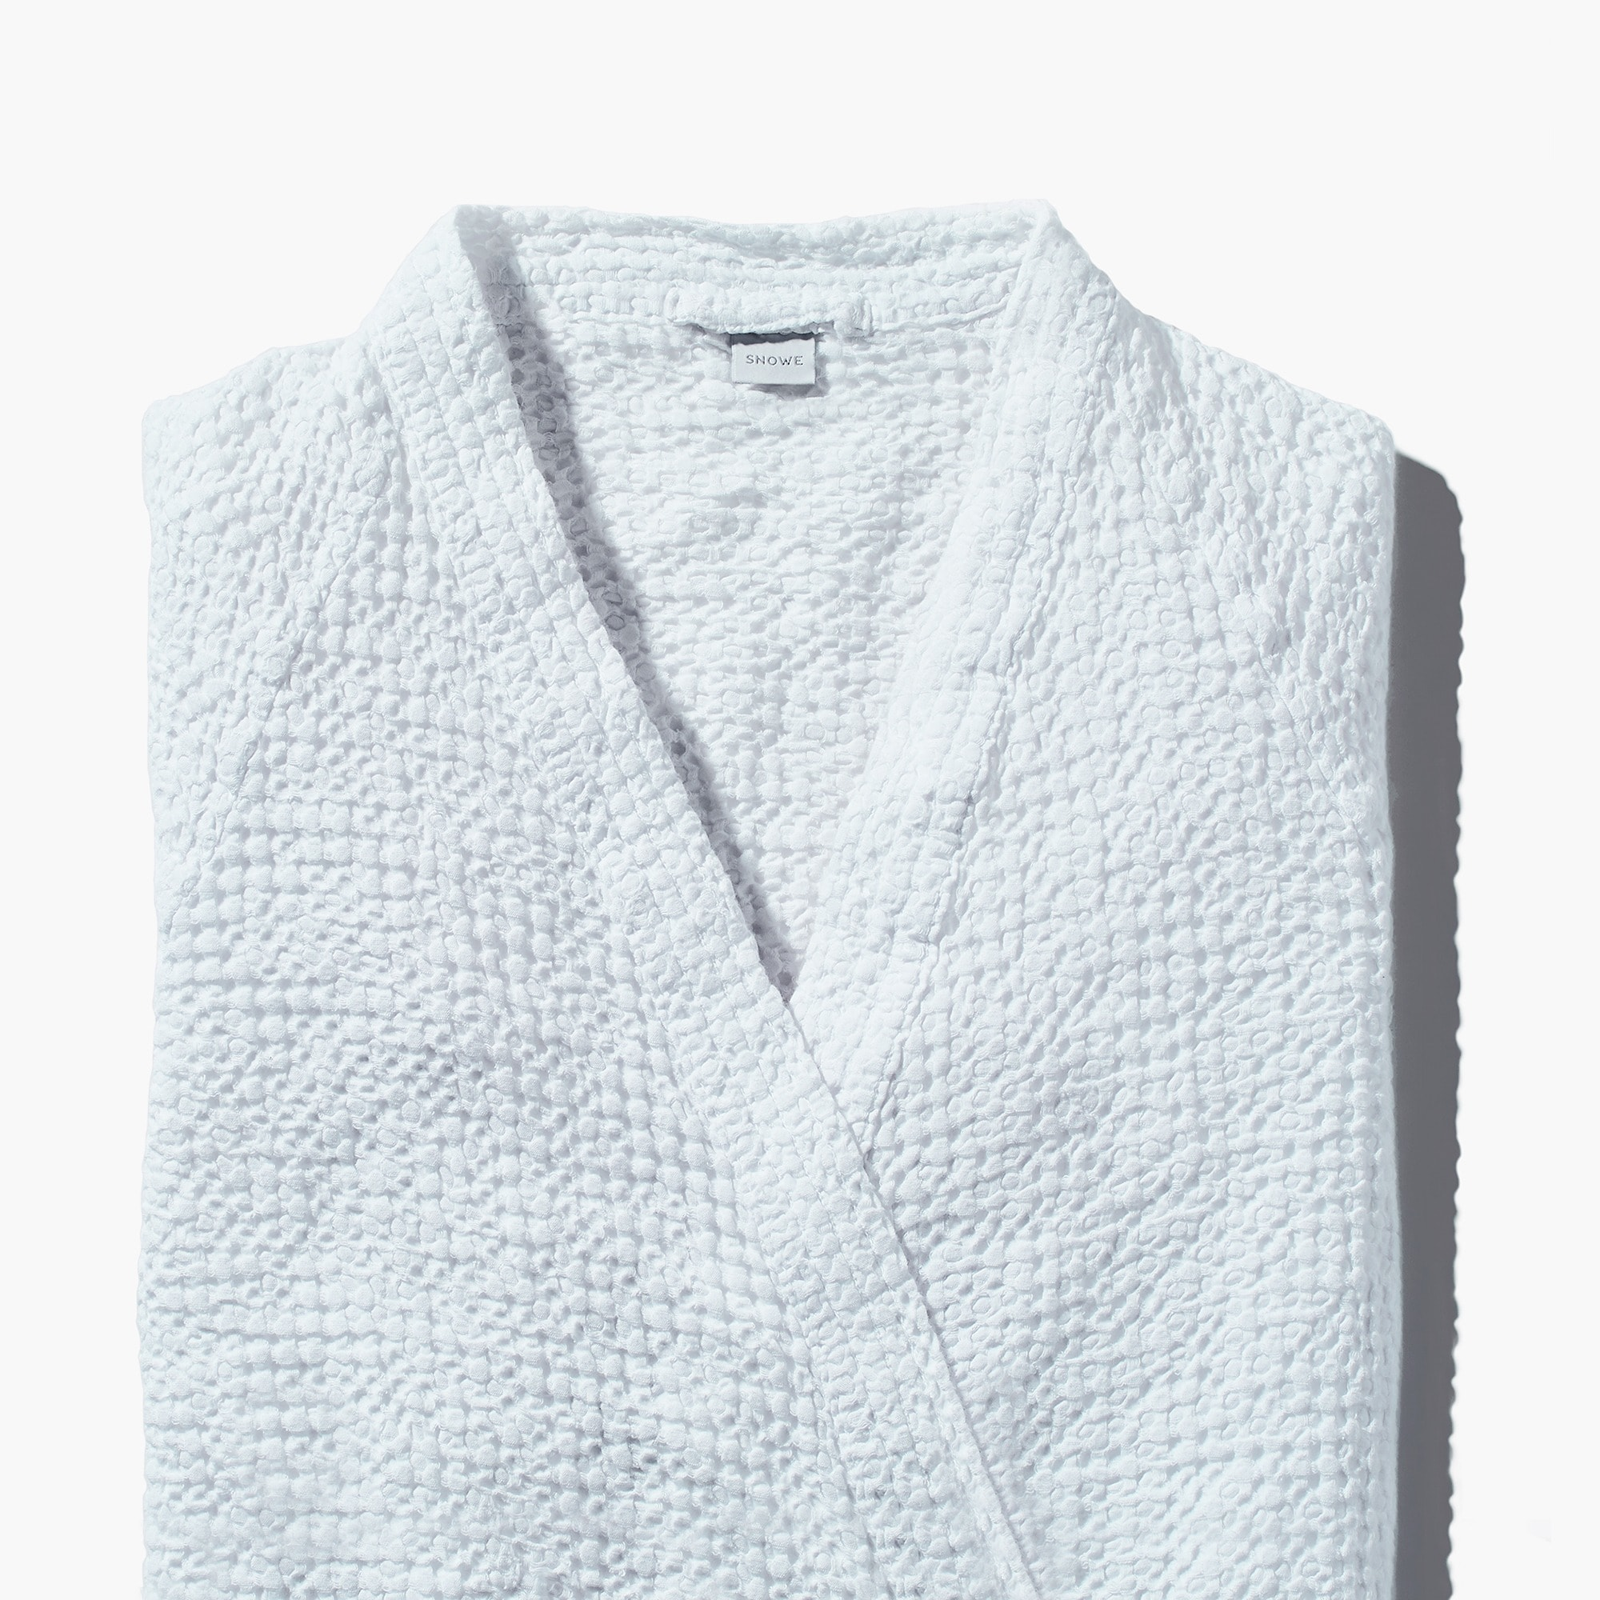 SNOWE™ Honeycomb bathrobe